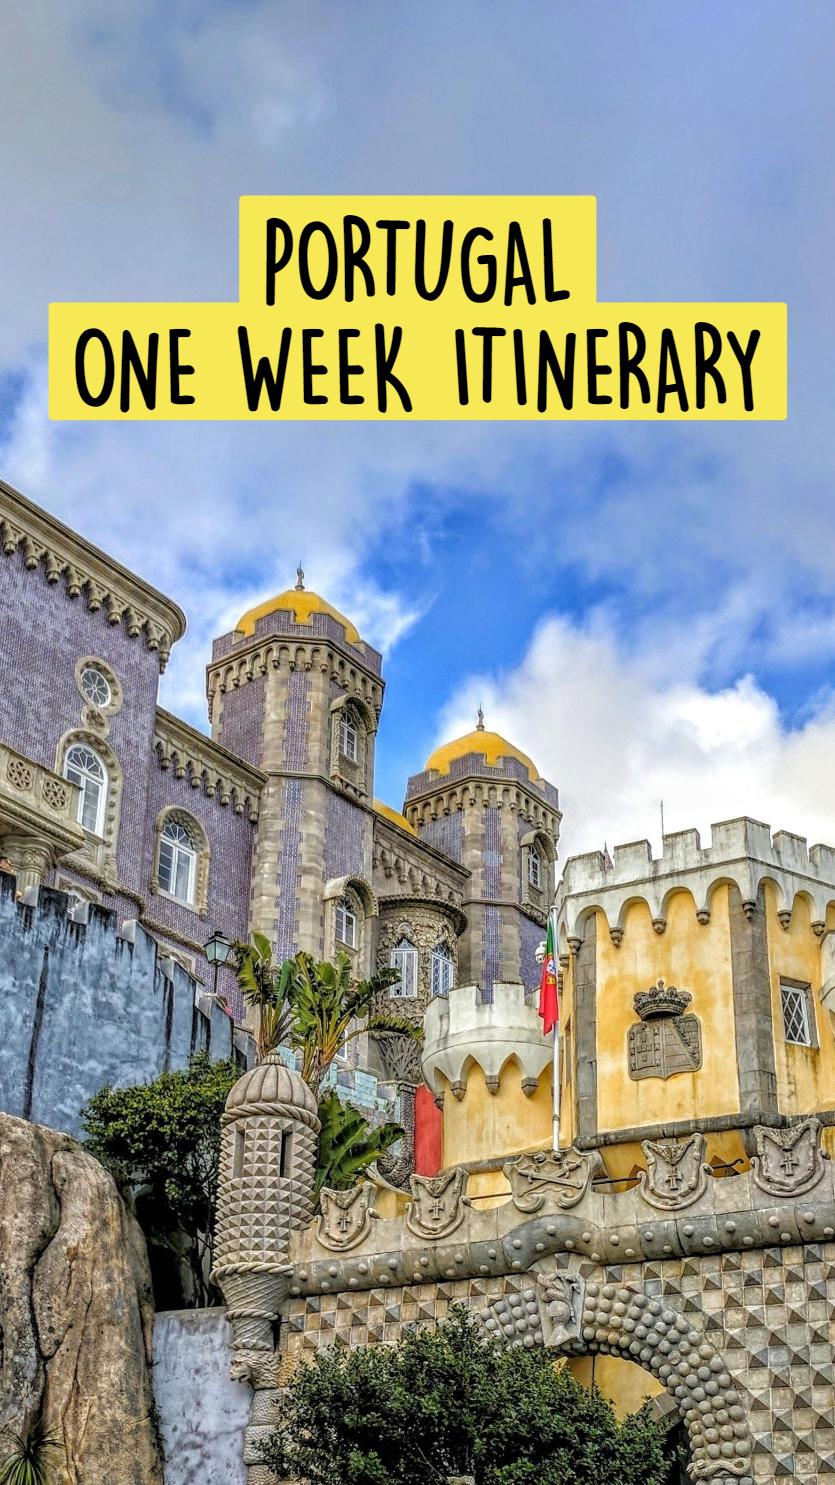 PORTUGAL - ONE WEEK ITINERARY